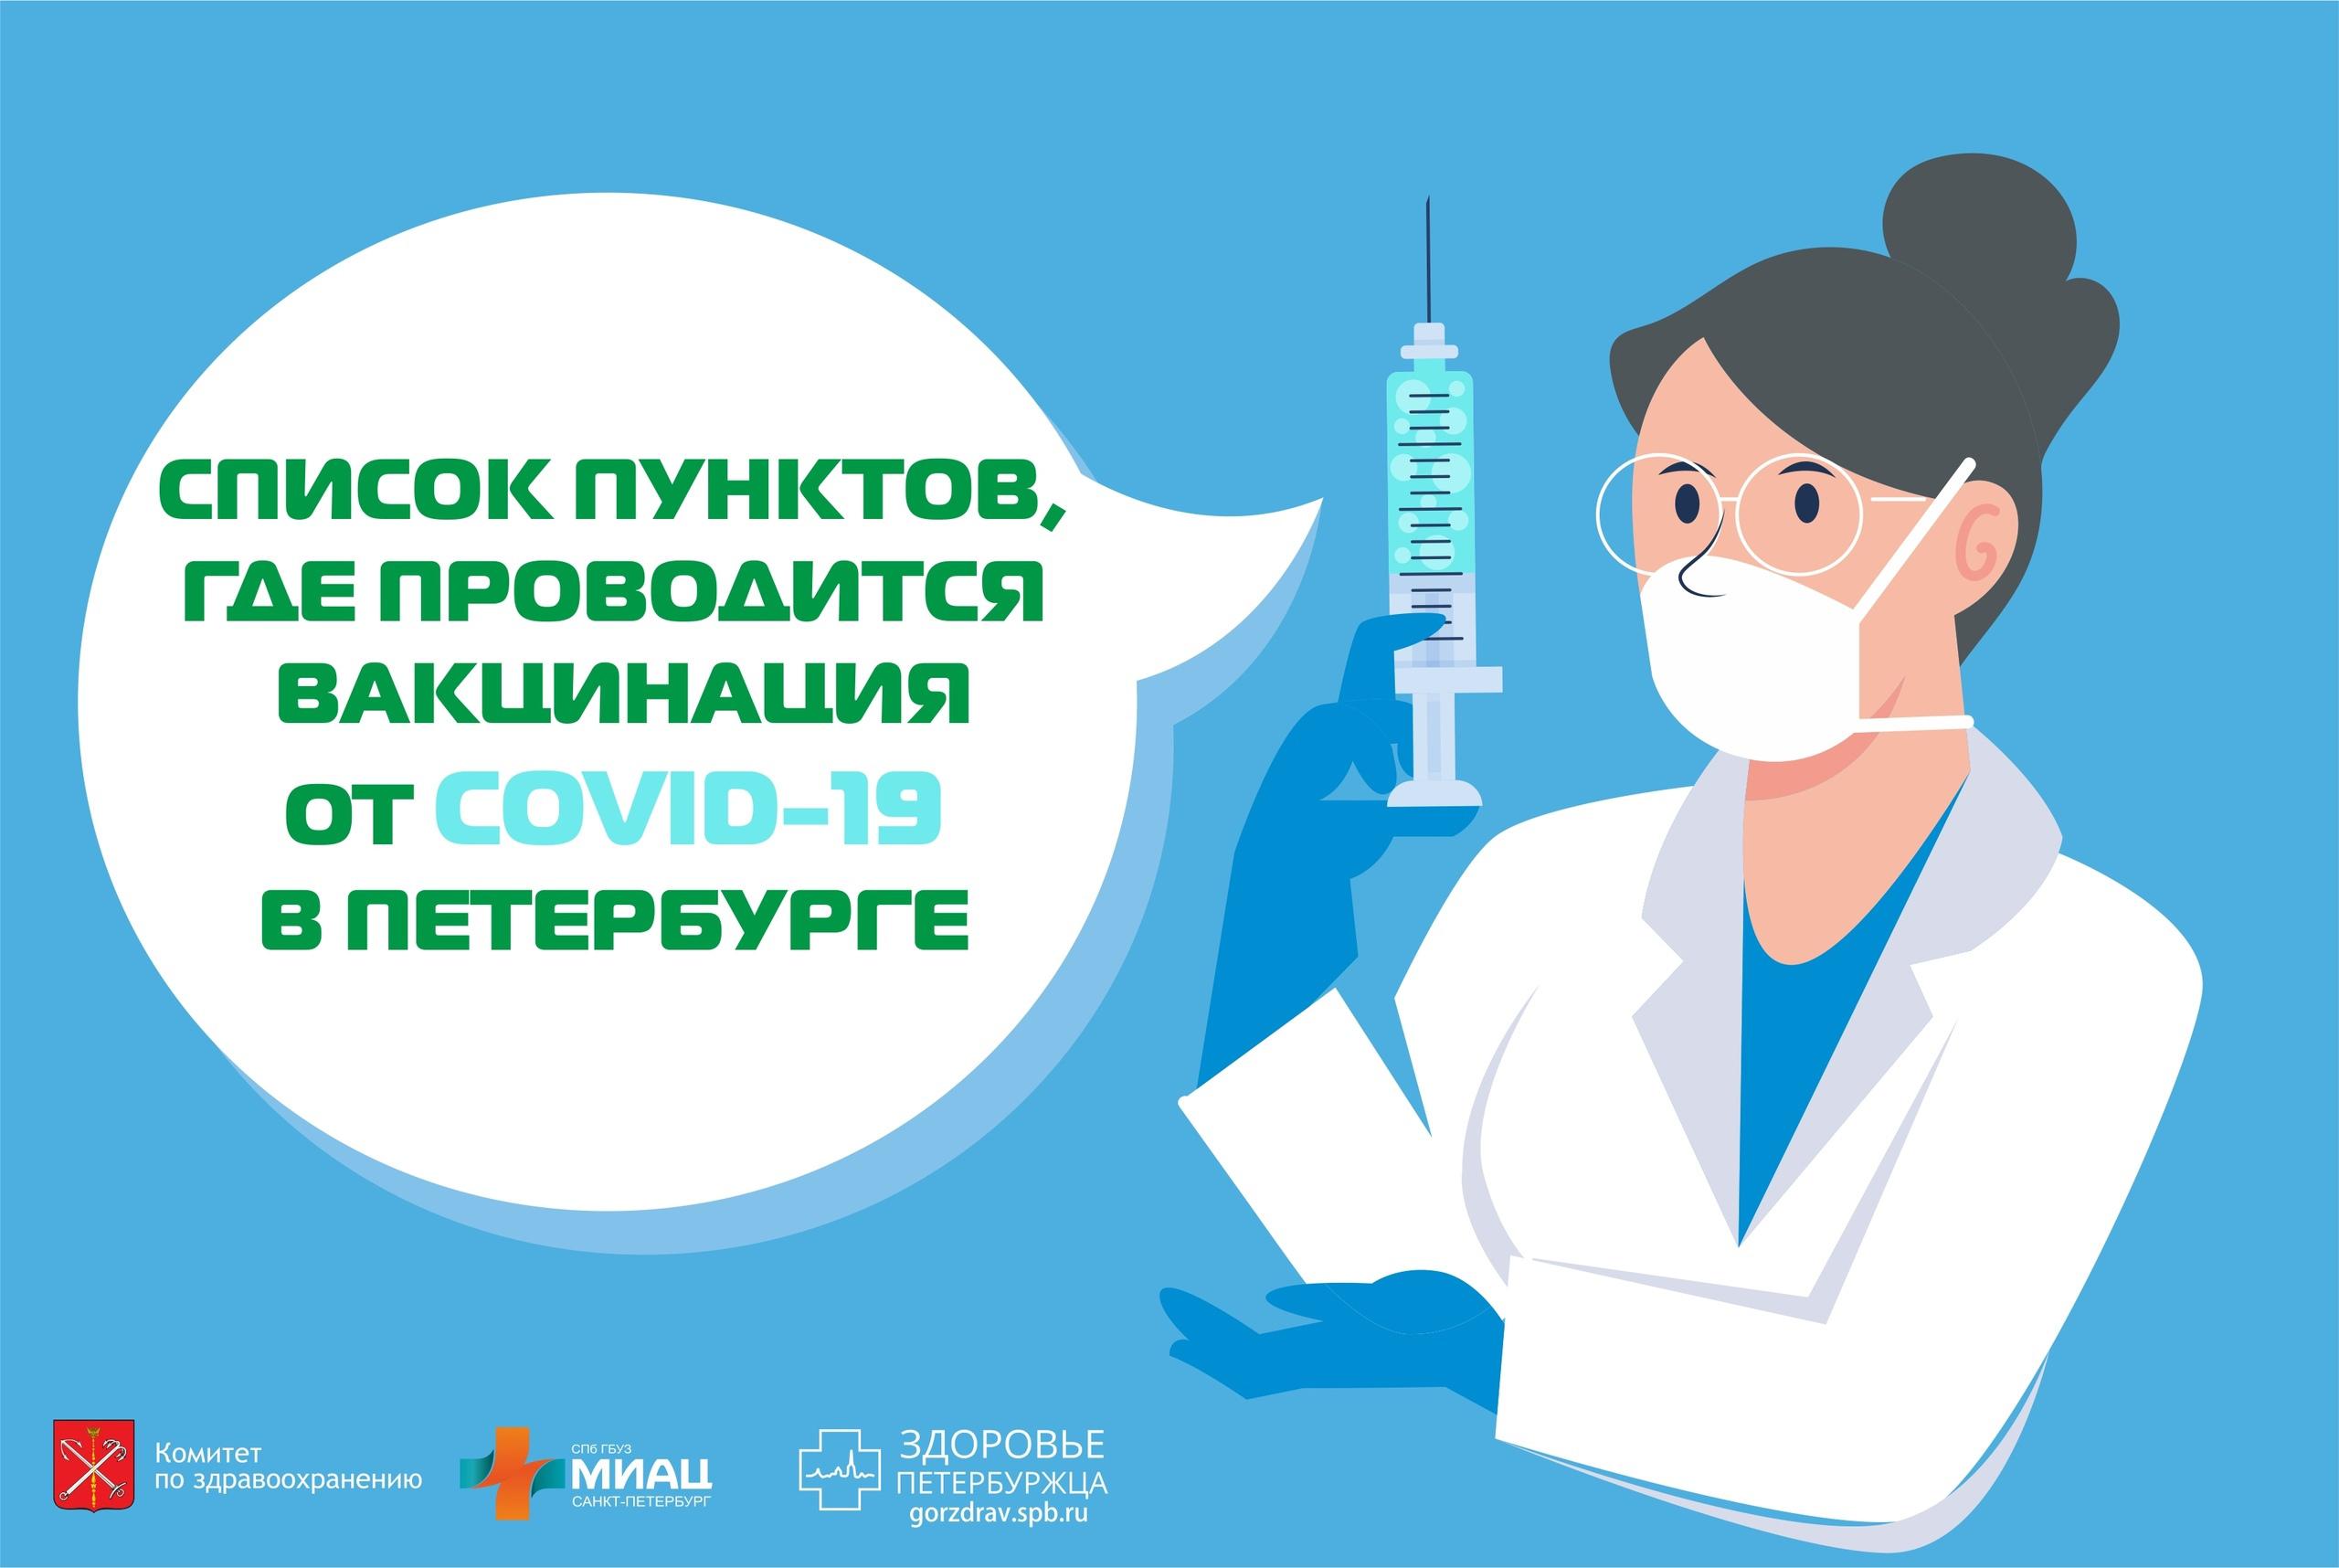 Пункты вакцинации